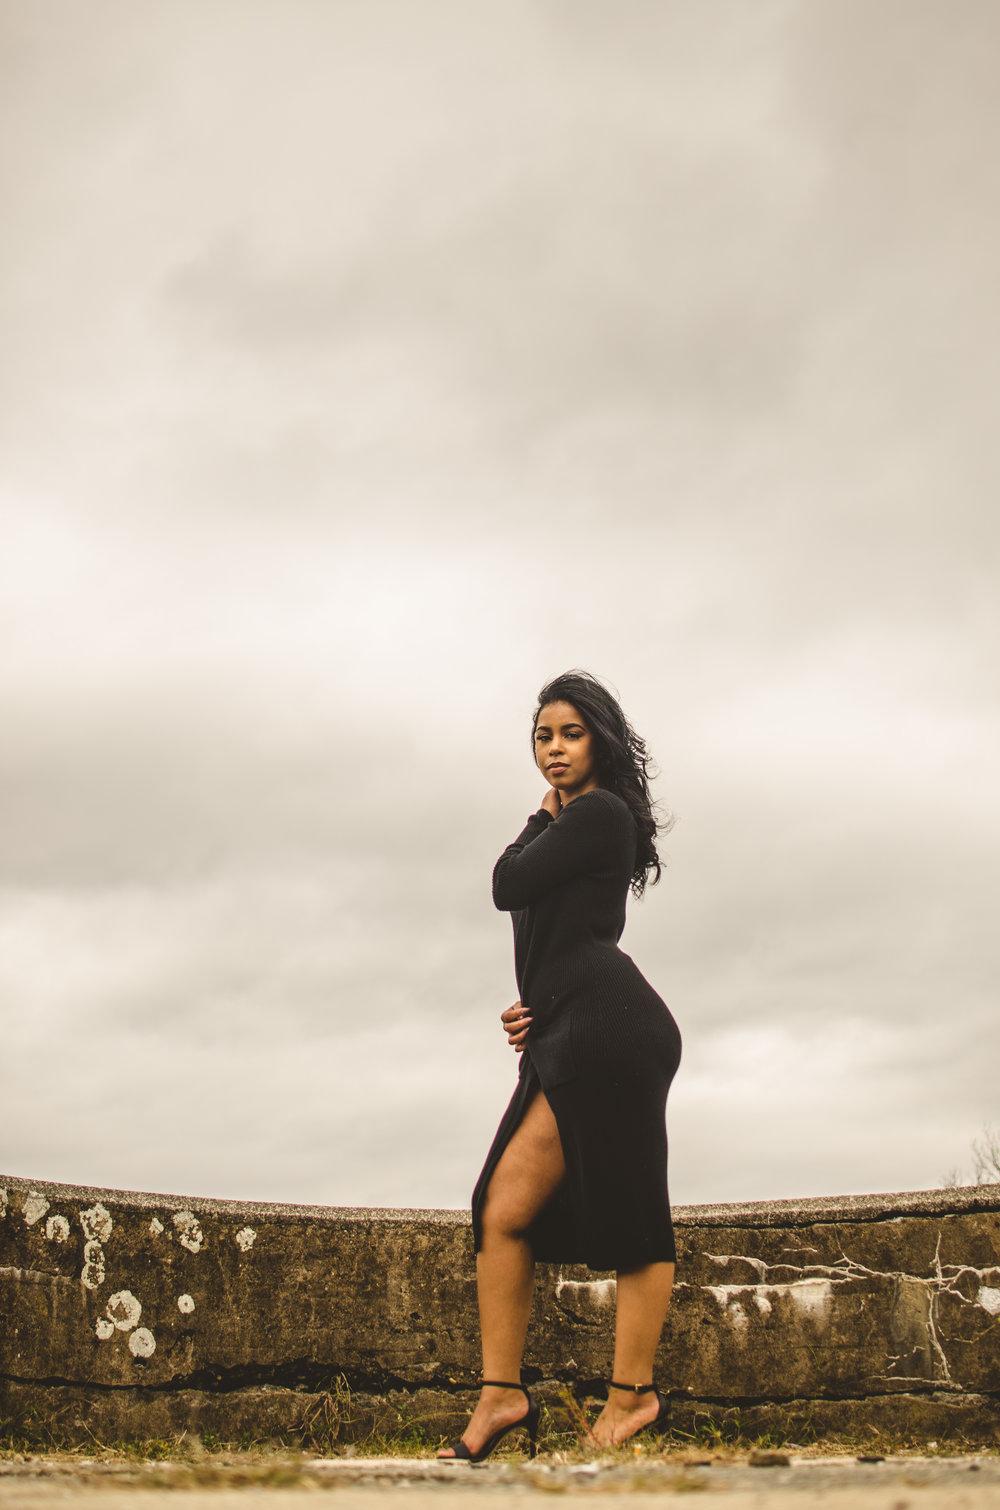 AaliyahRuins-26.jpg